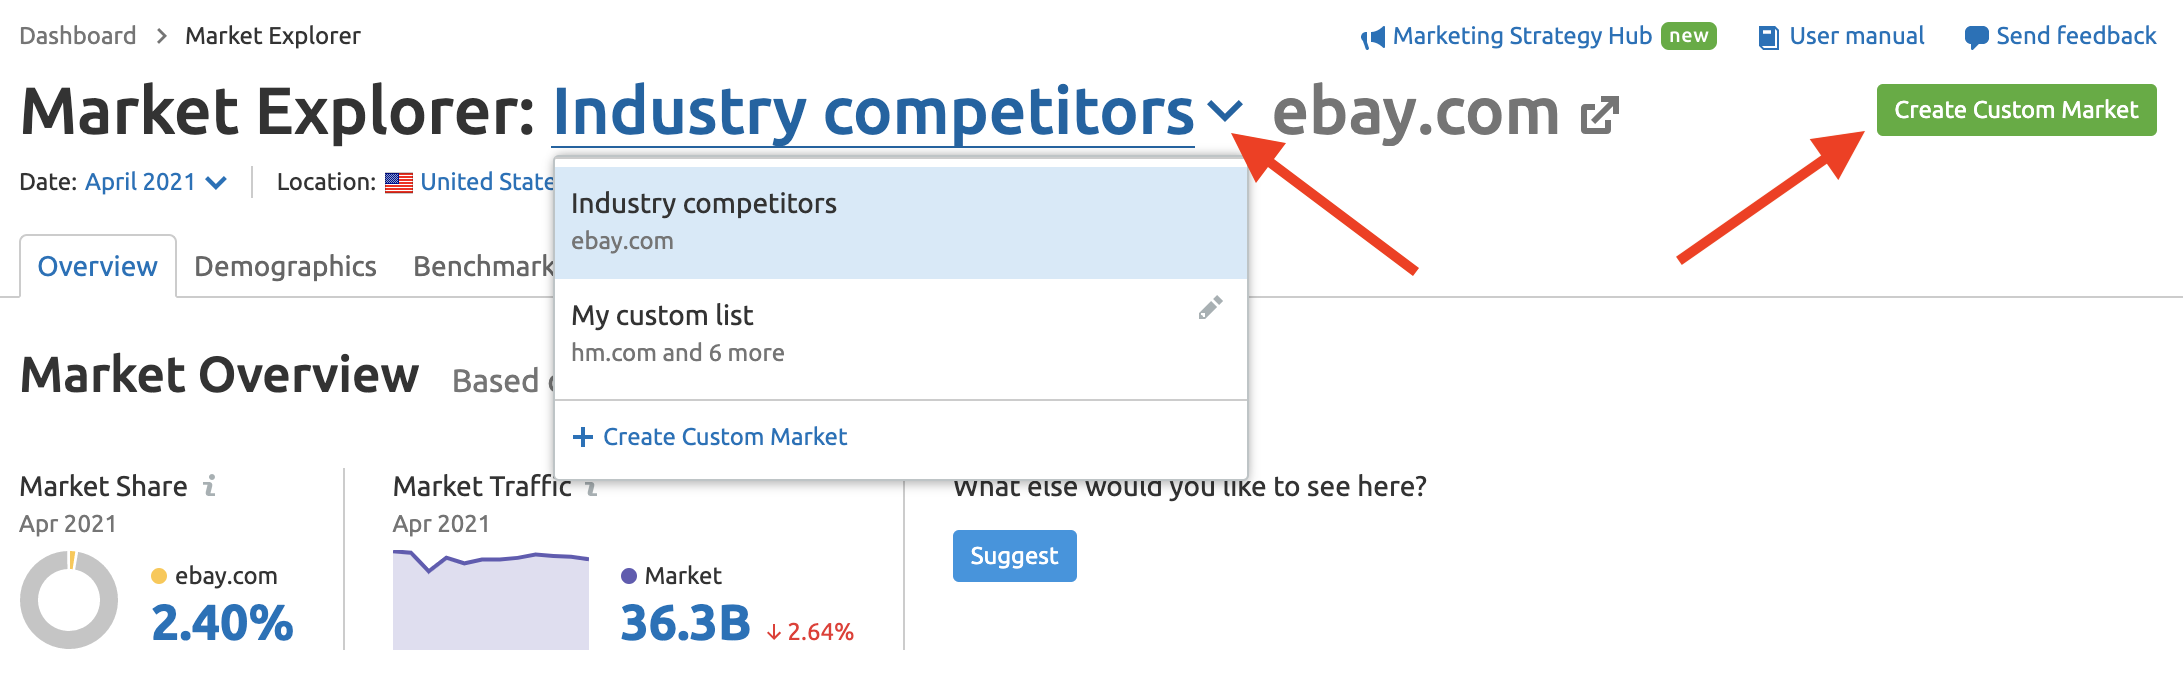 Market Explorer Custom Industry Market Report image 1